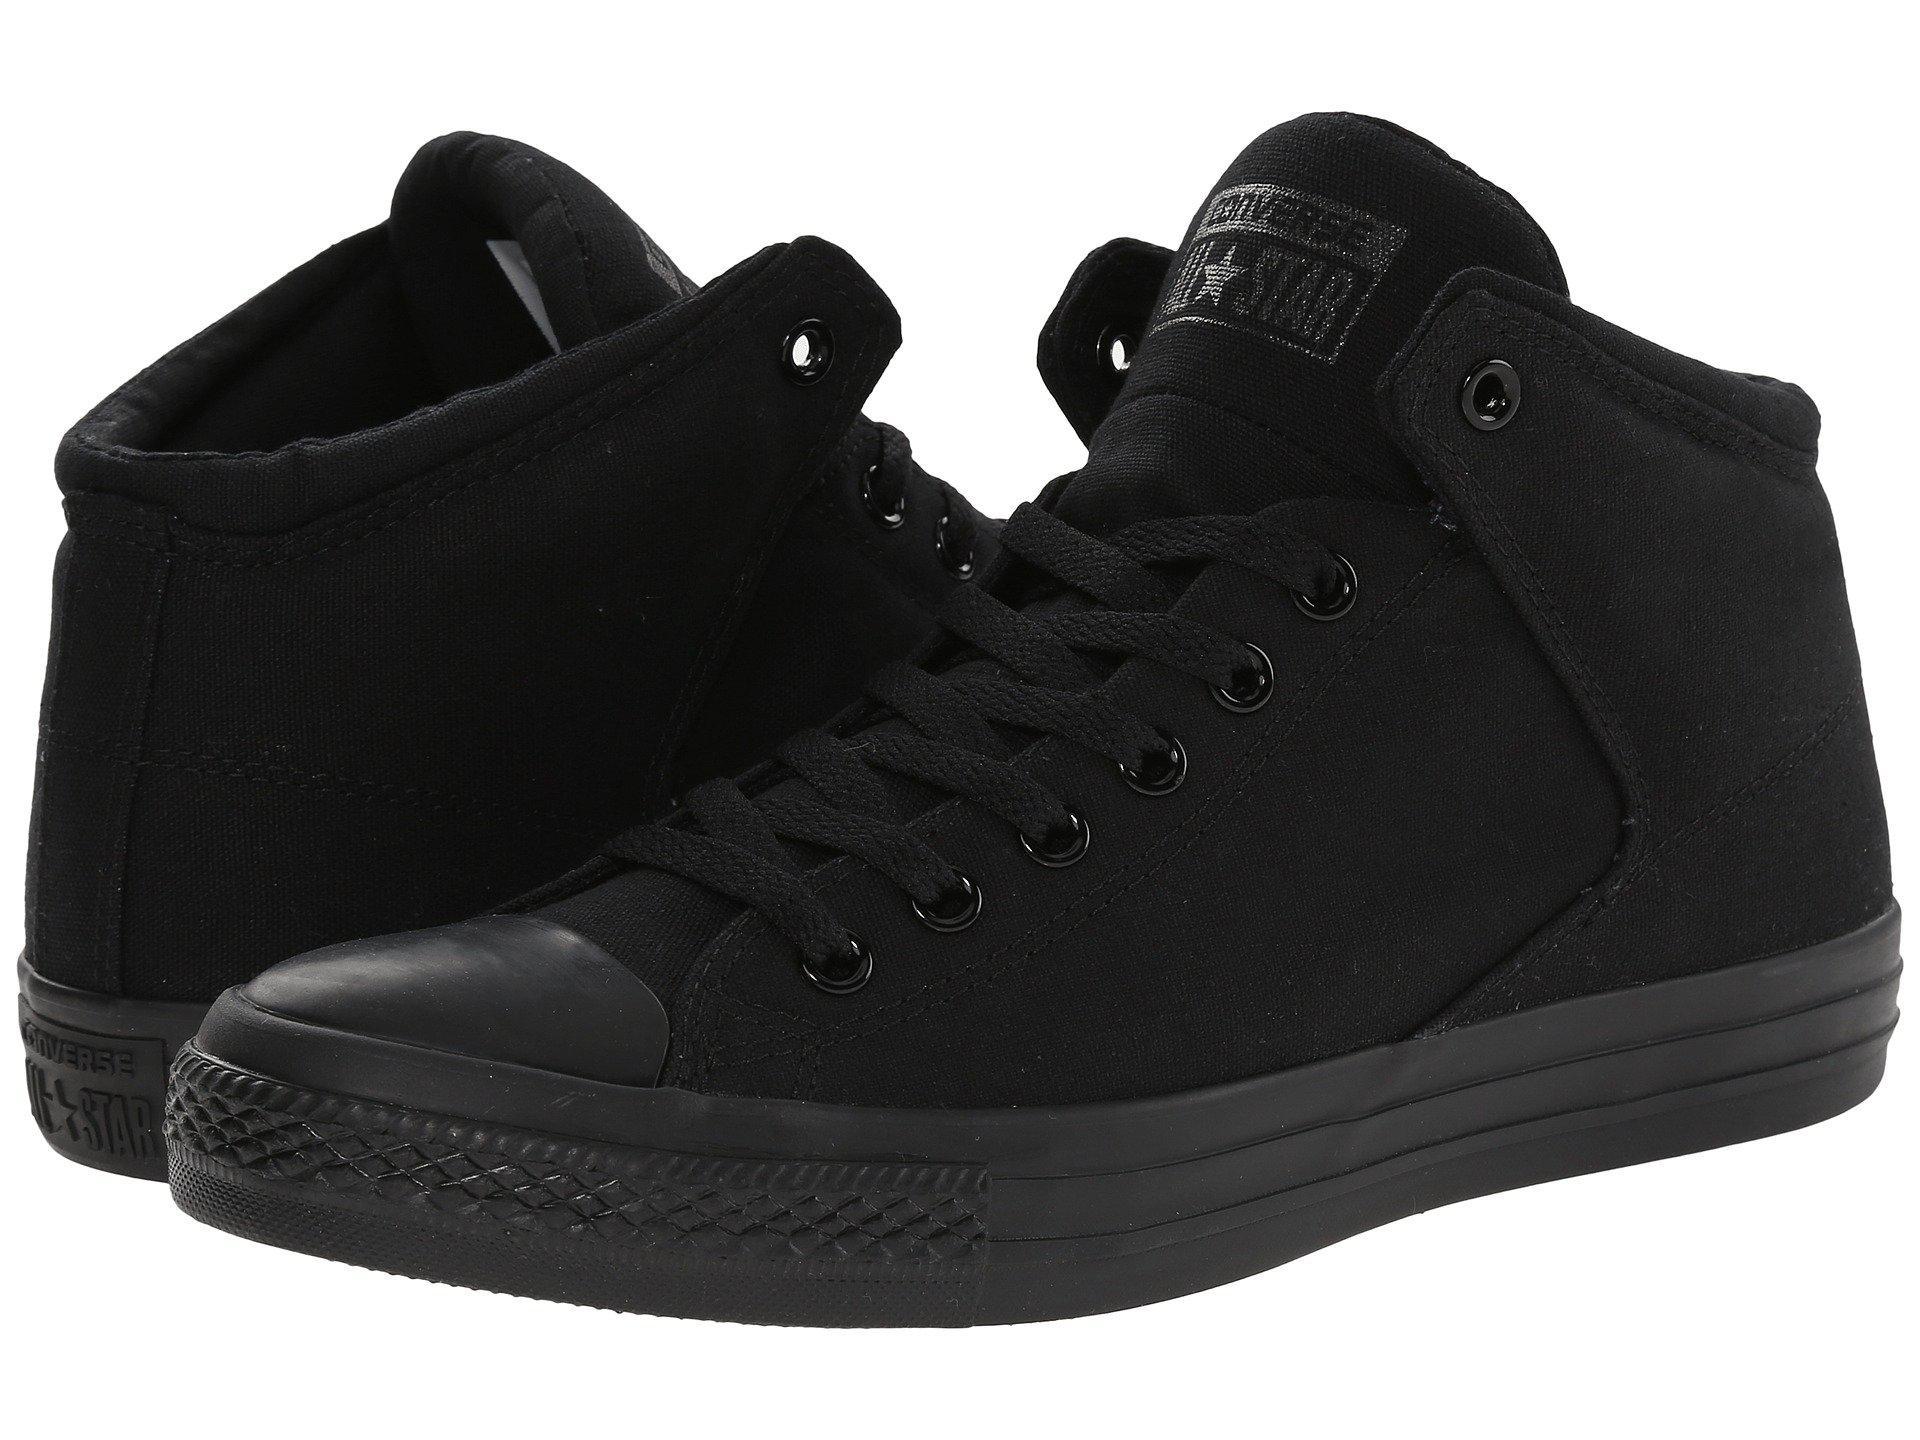 ef1c9023d535 Converse. Women s Chuck Taylor(r) All Star(r) High Street Mono Canvas Hi ( black black black) Lace Up Casual Shoes